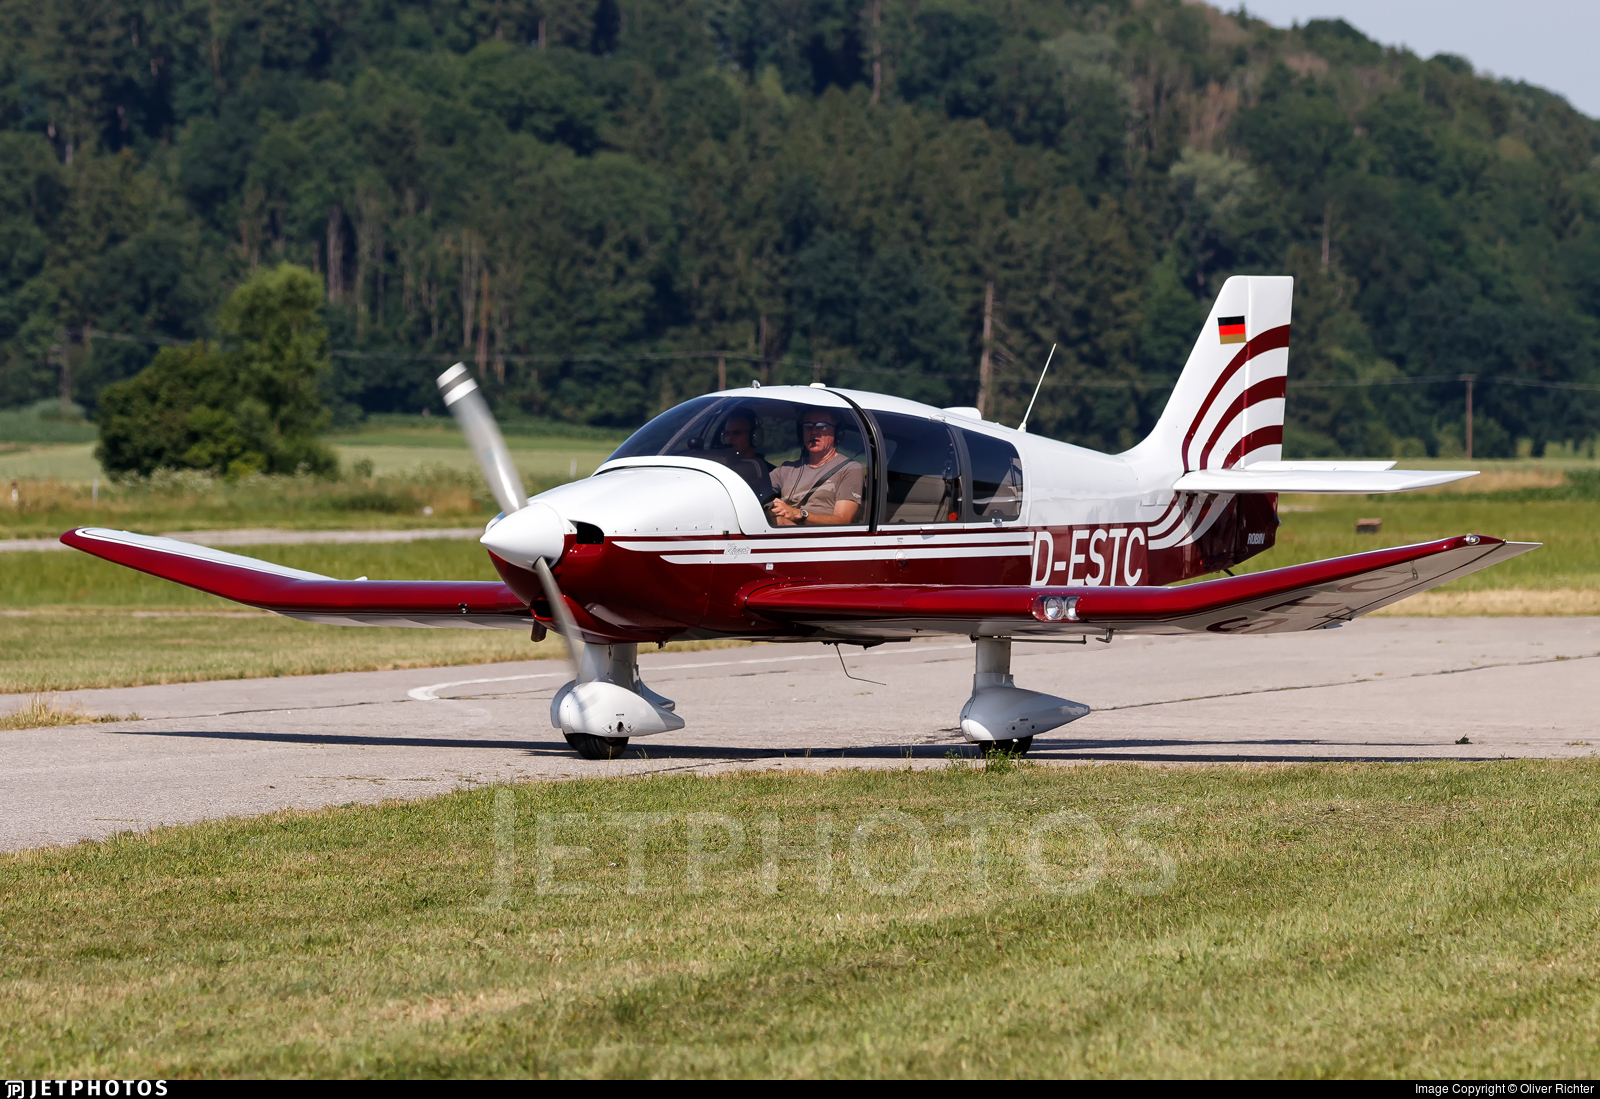 D-ESTC - Robin DR400/180 Régent - Fliegerclub Mühldorf